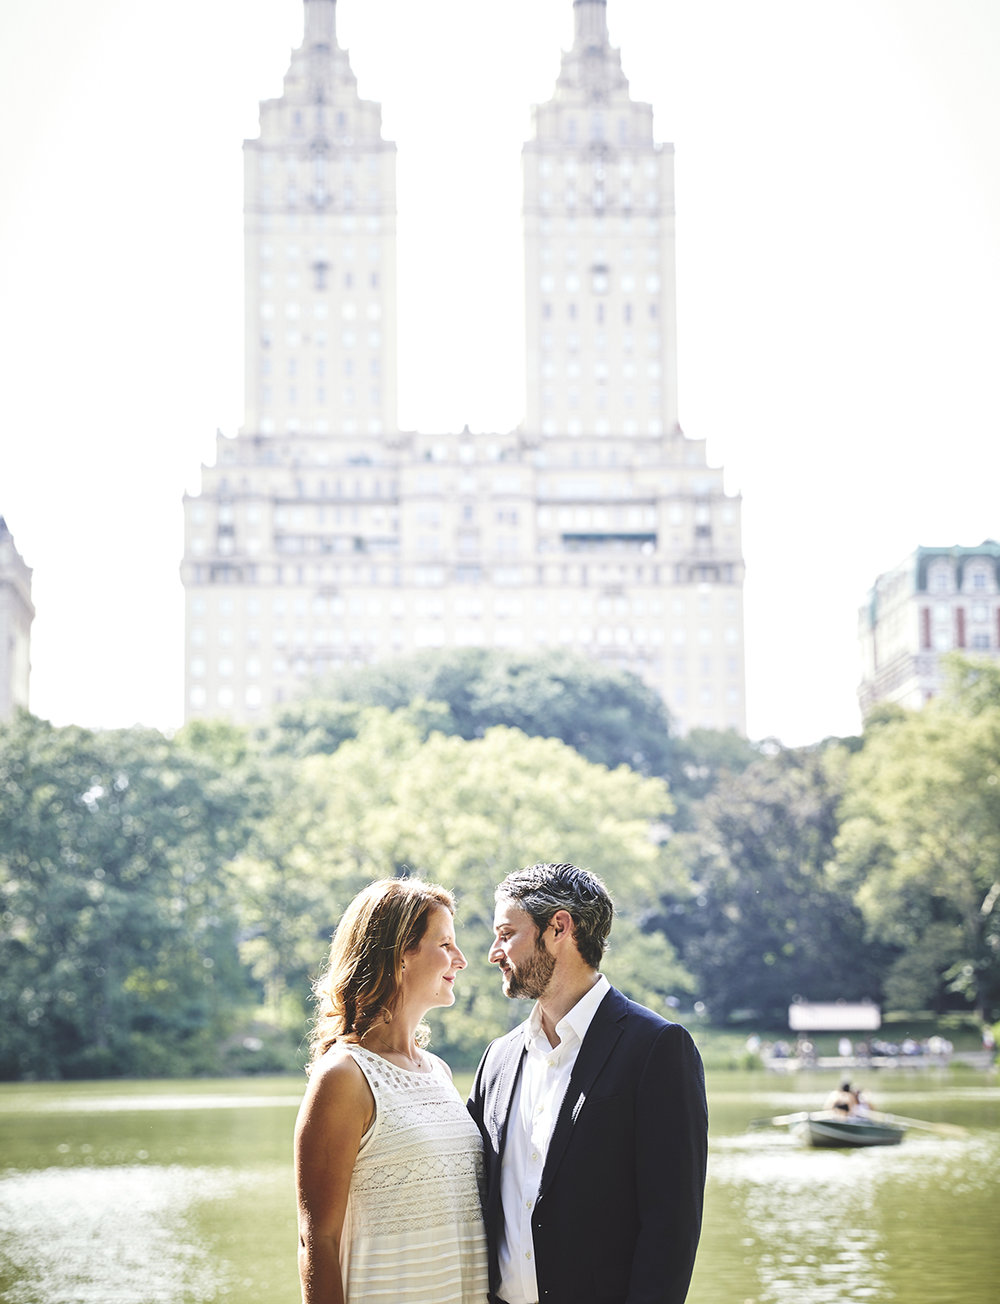 170720_EngagementPhotography_CentralPark_By_BriJohnsonWeddings_0002.jpg